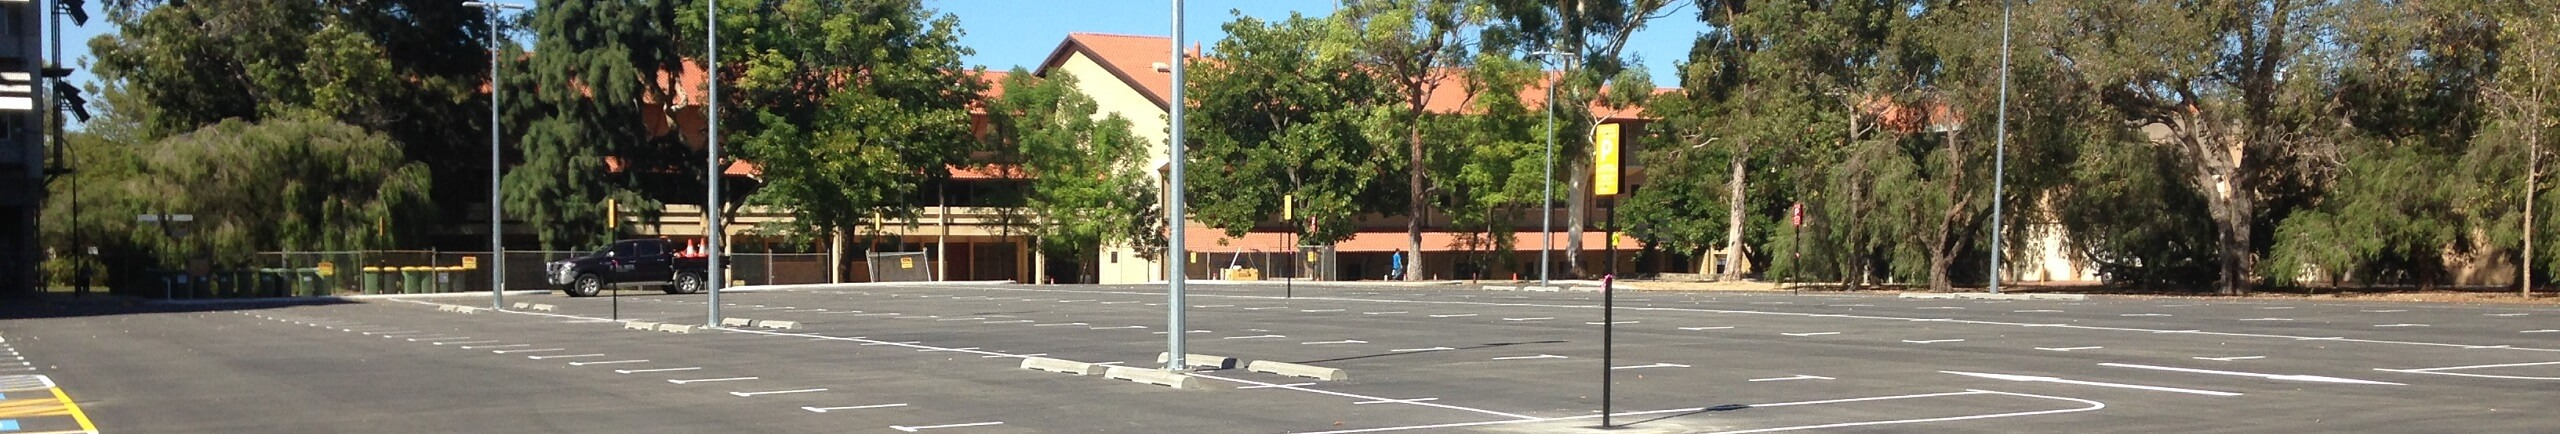 Slider_3 car park in perth